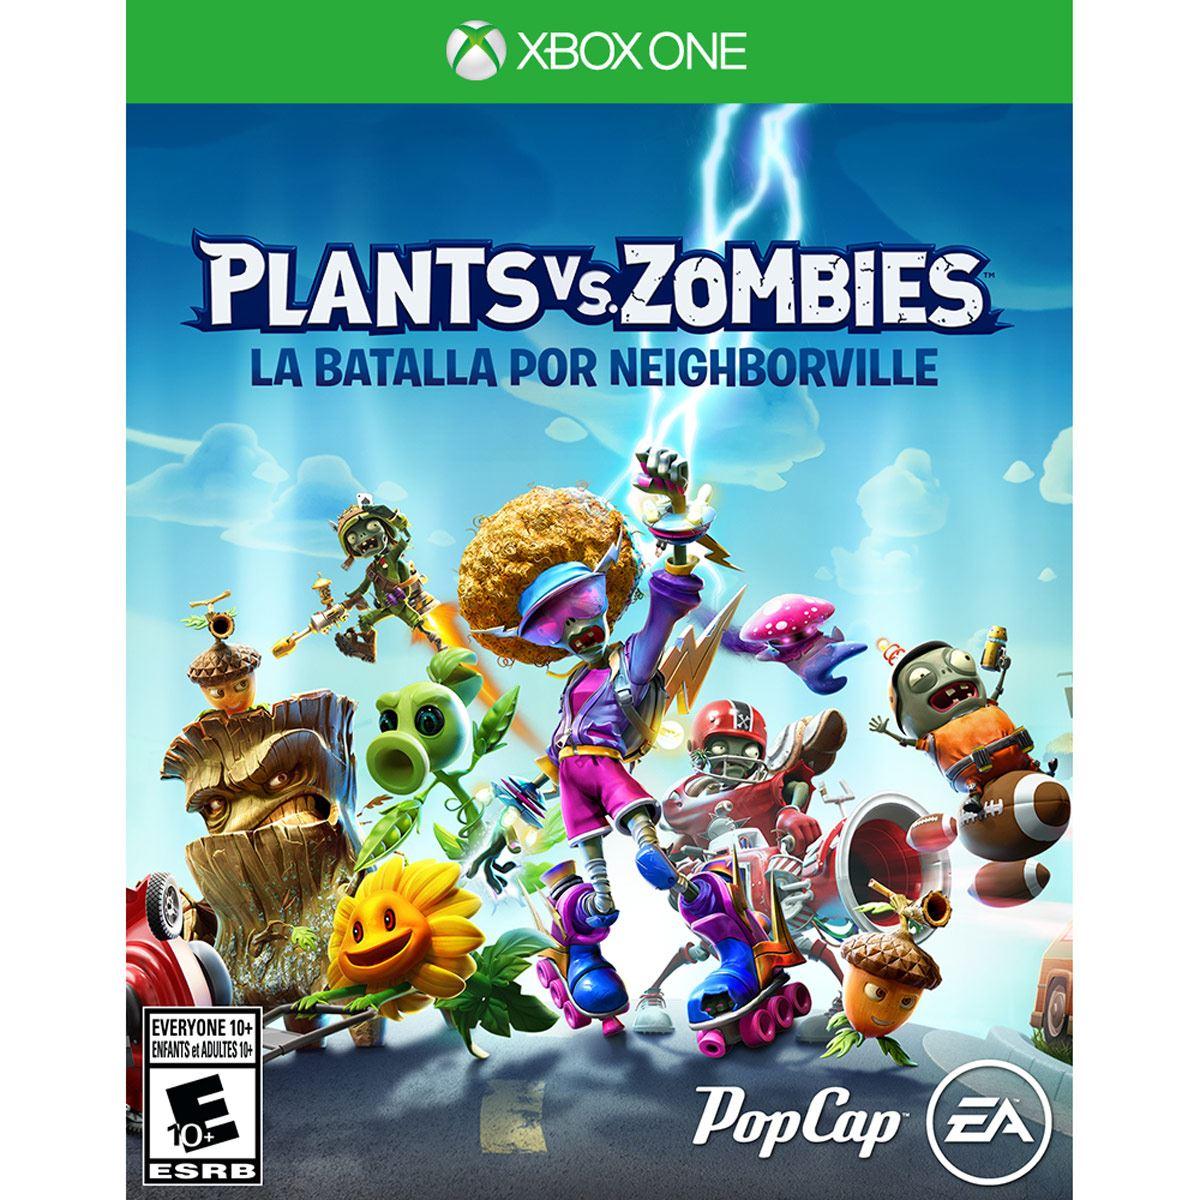 Plants vs. Zombies - La Batalla por Neighborville Xbox One